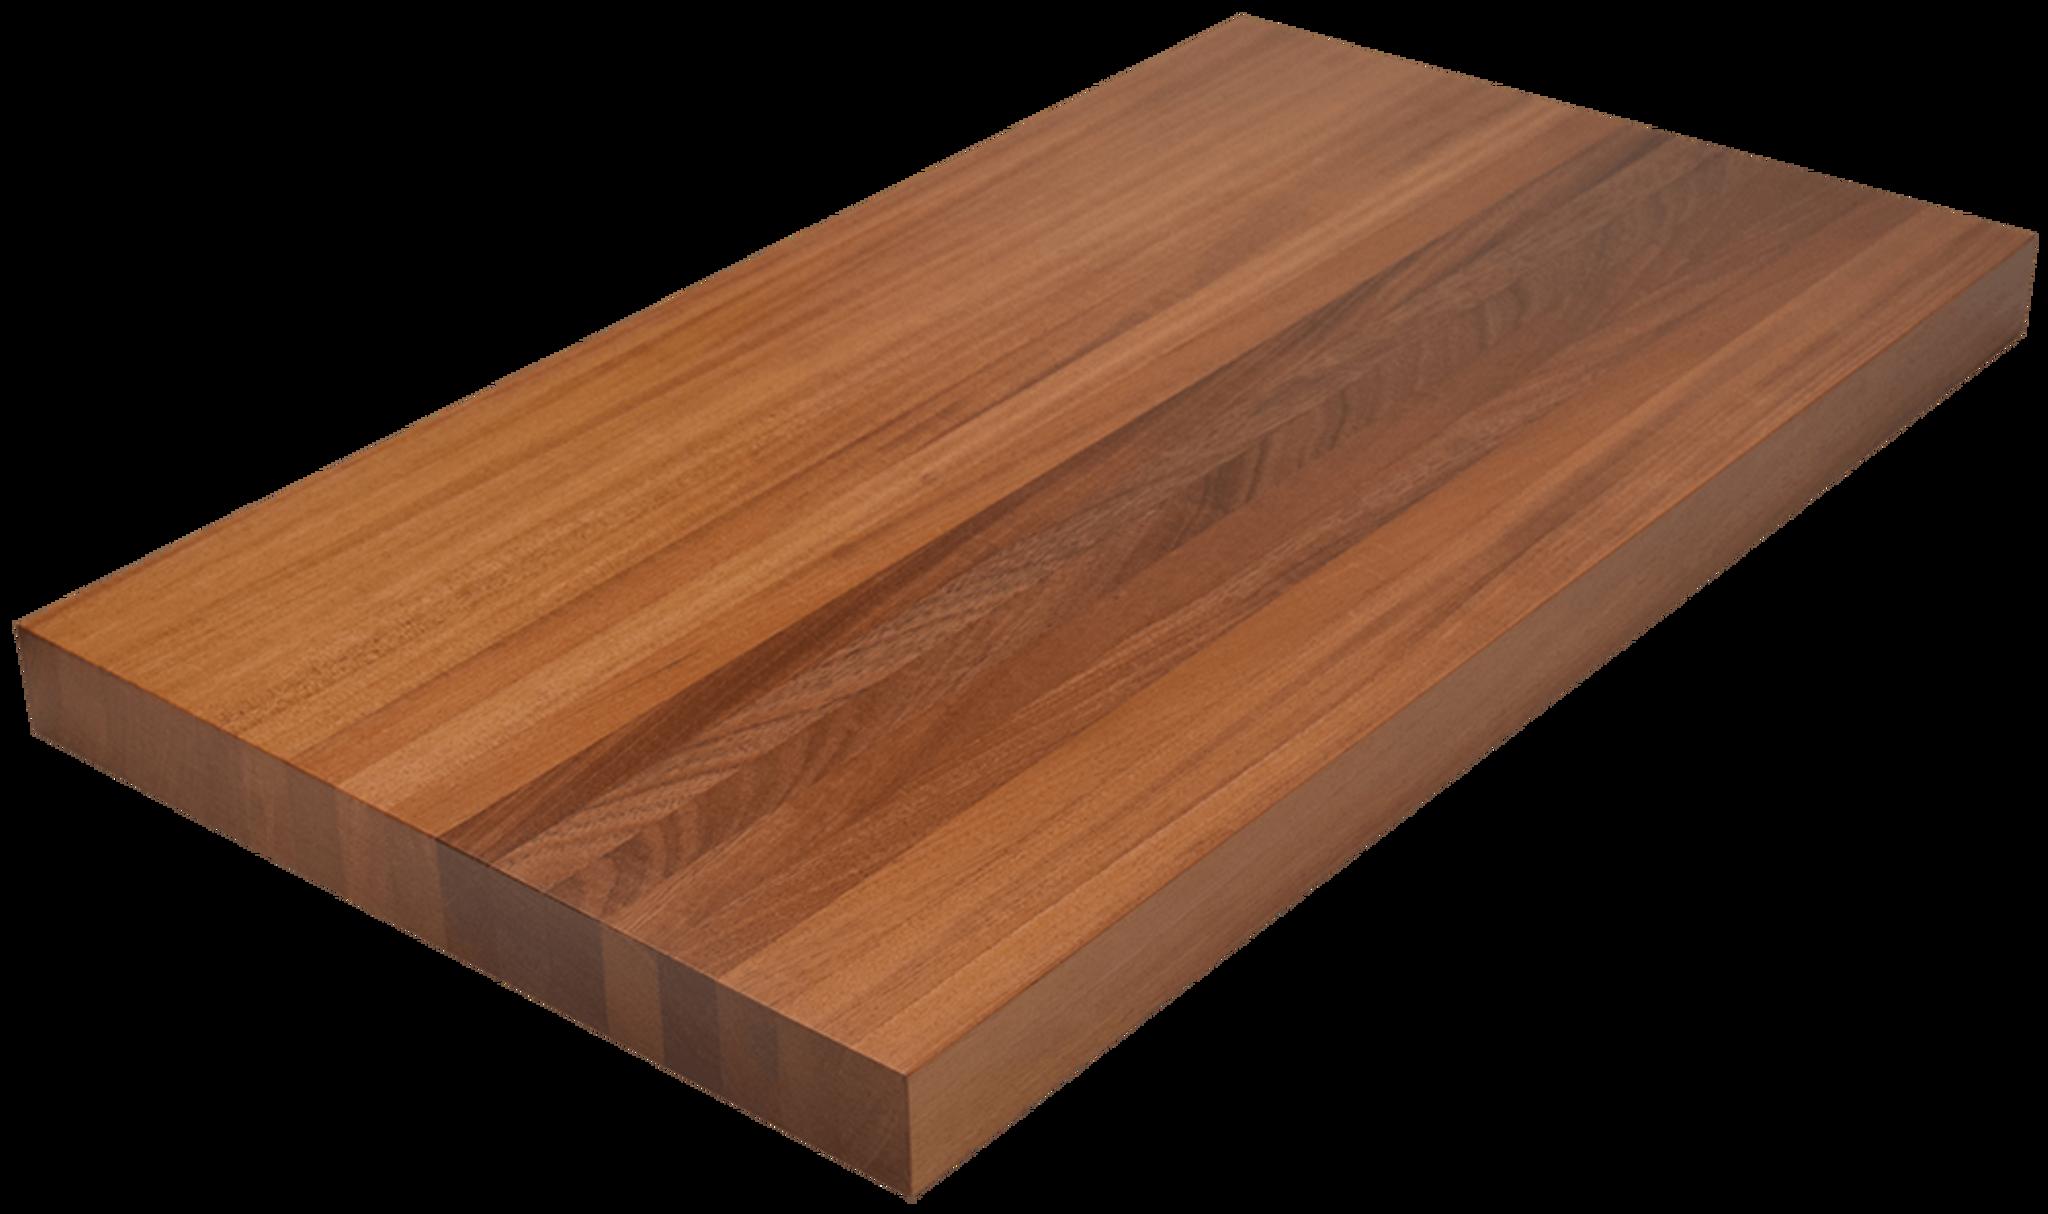 African mahogany edge grain butcher block countertop